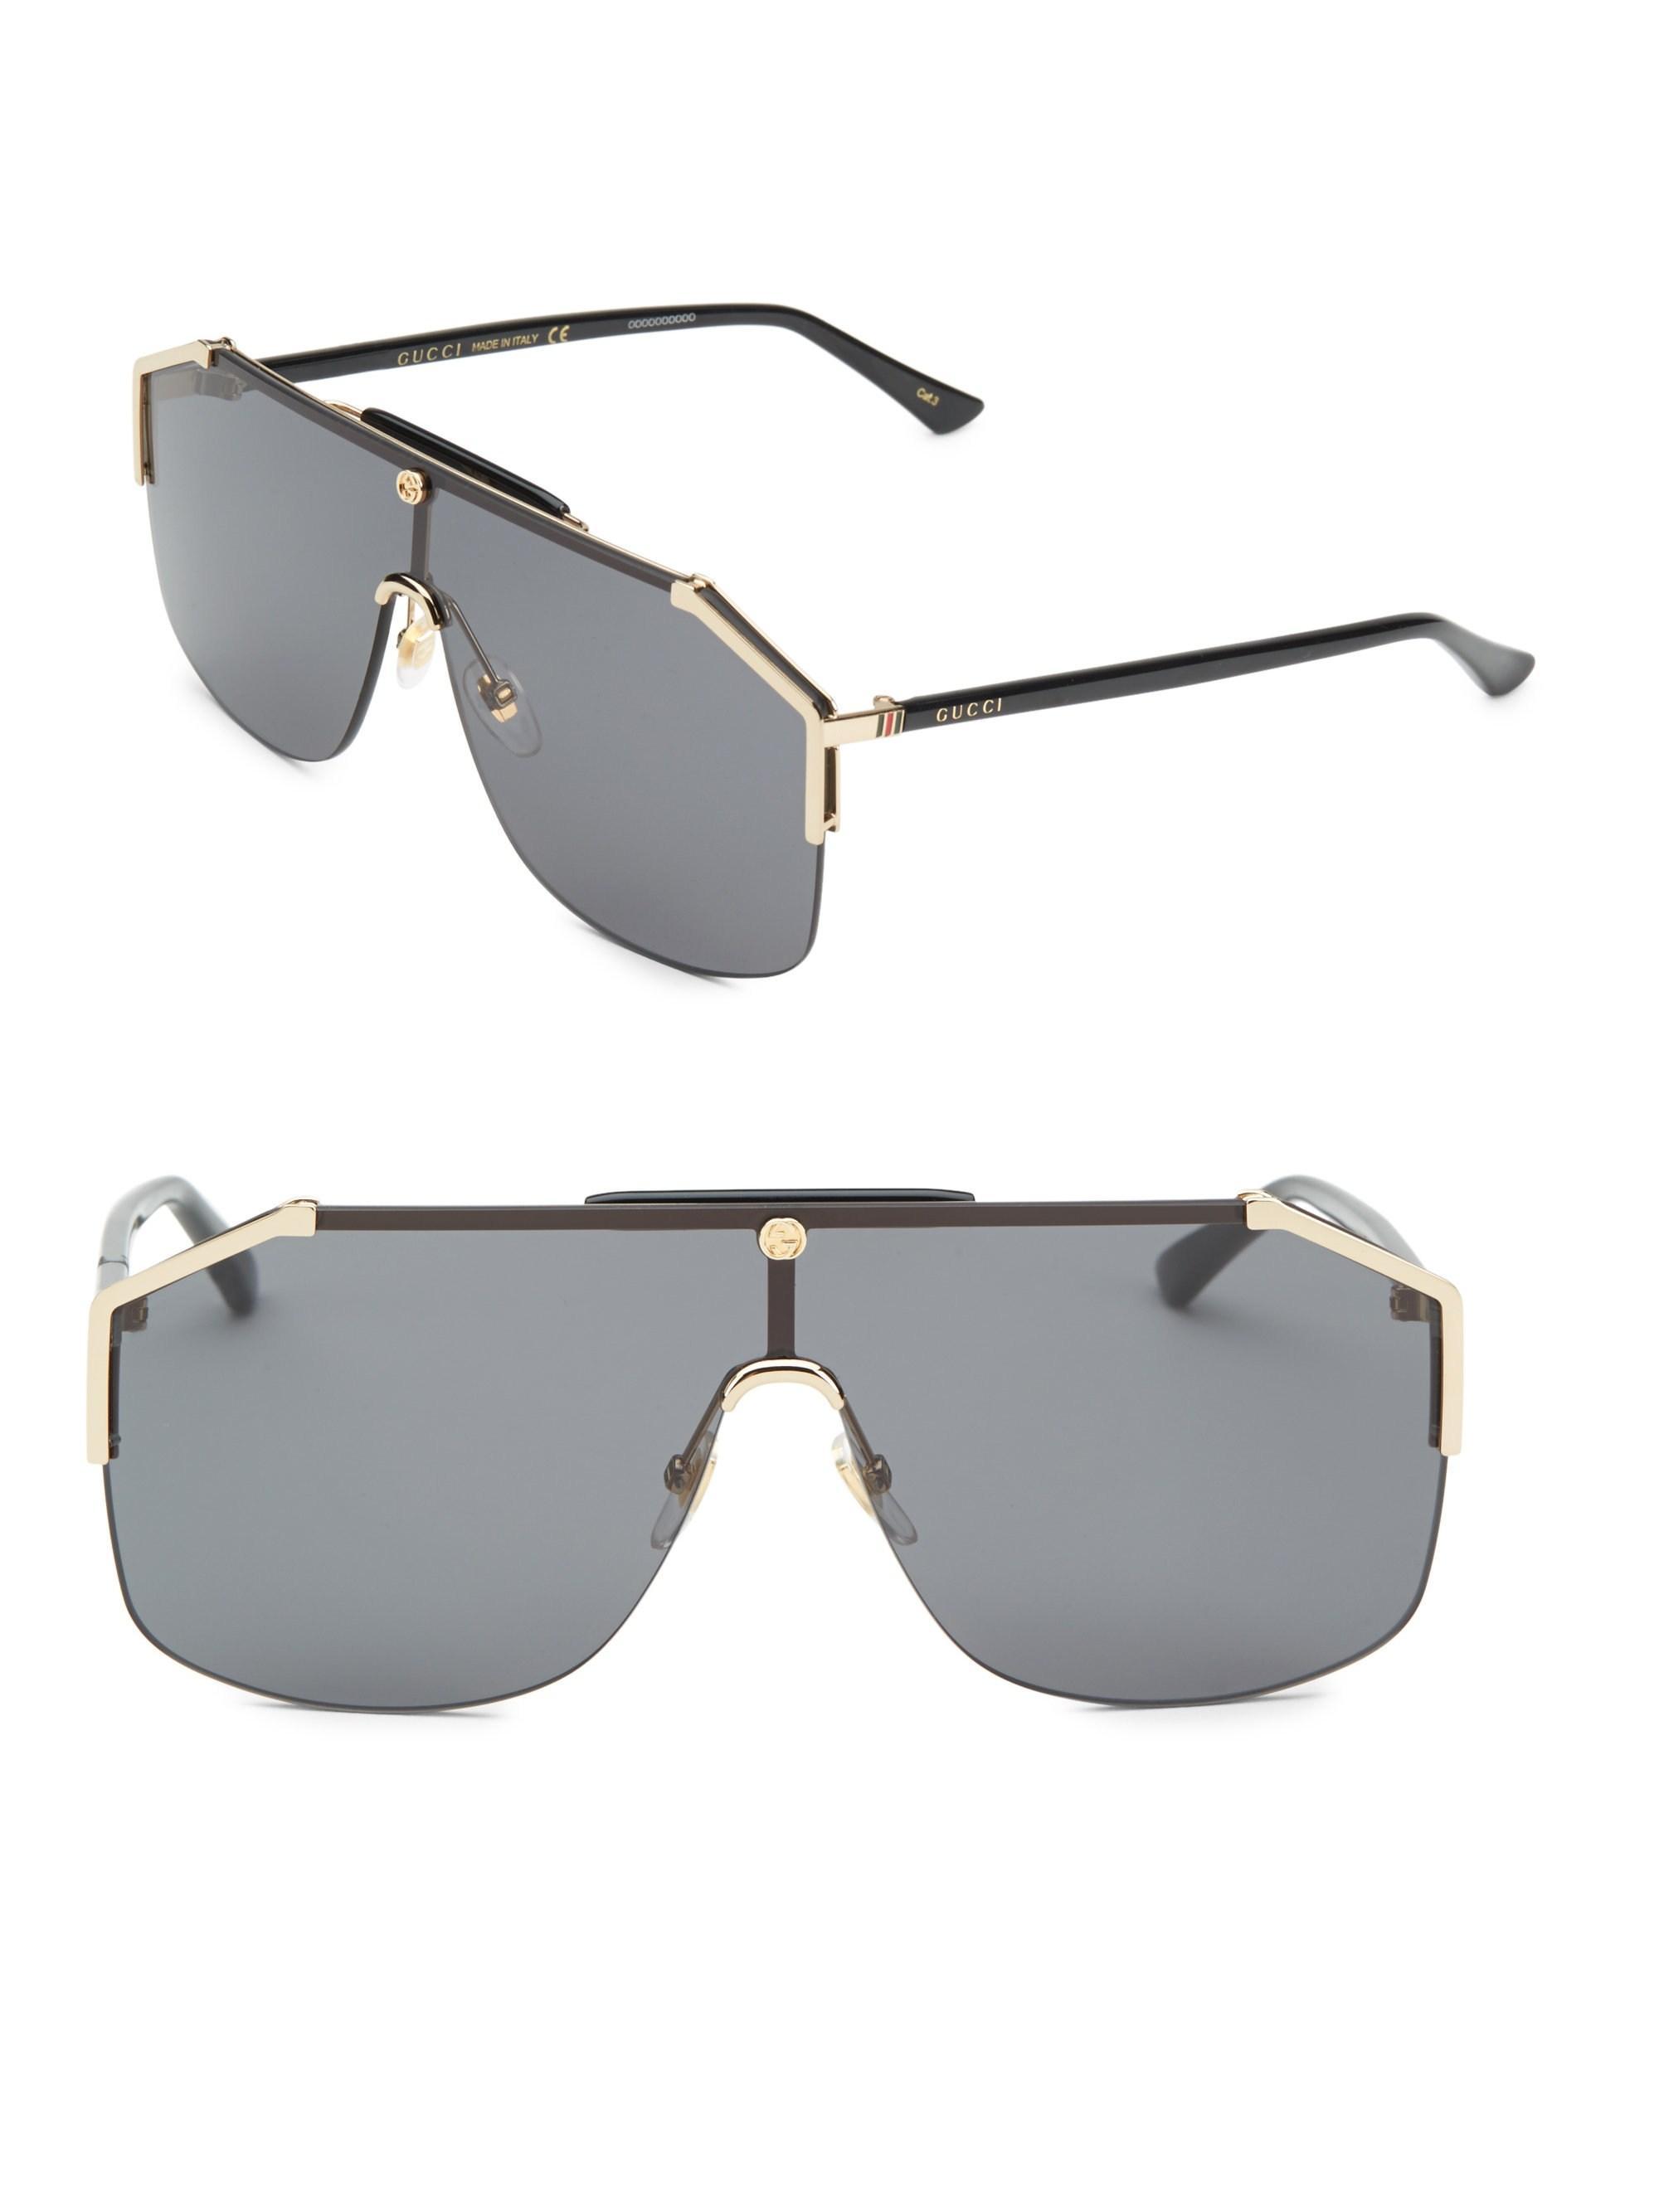 a9db4f9ec4 Gucci Men s 99mm Shield Sunglasses - Black Gold for Men - Lyst